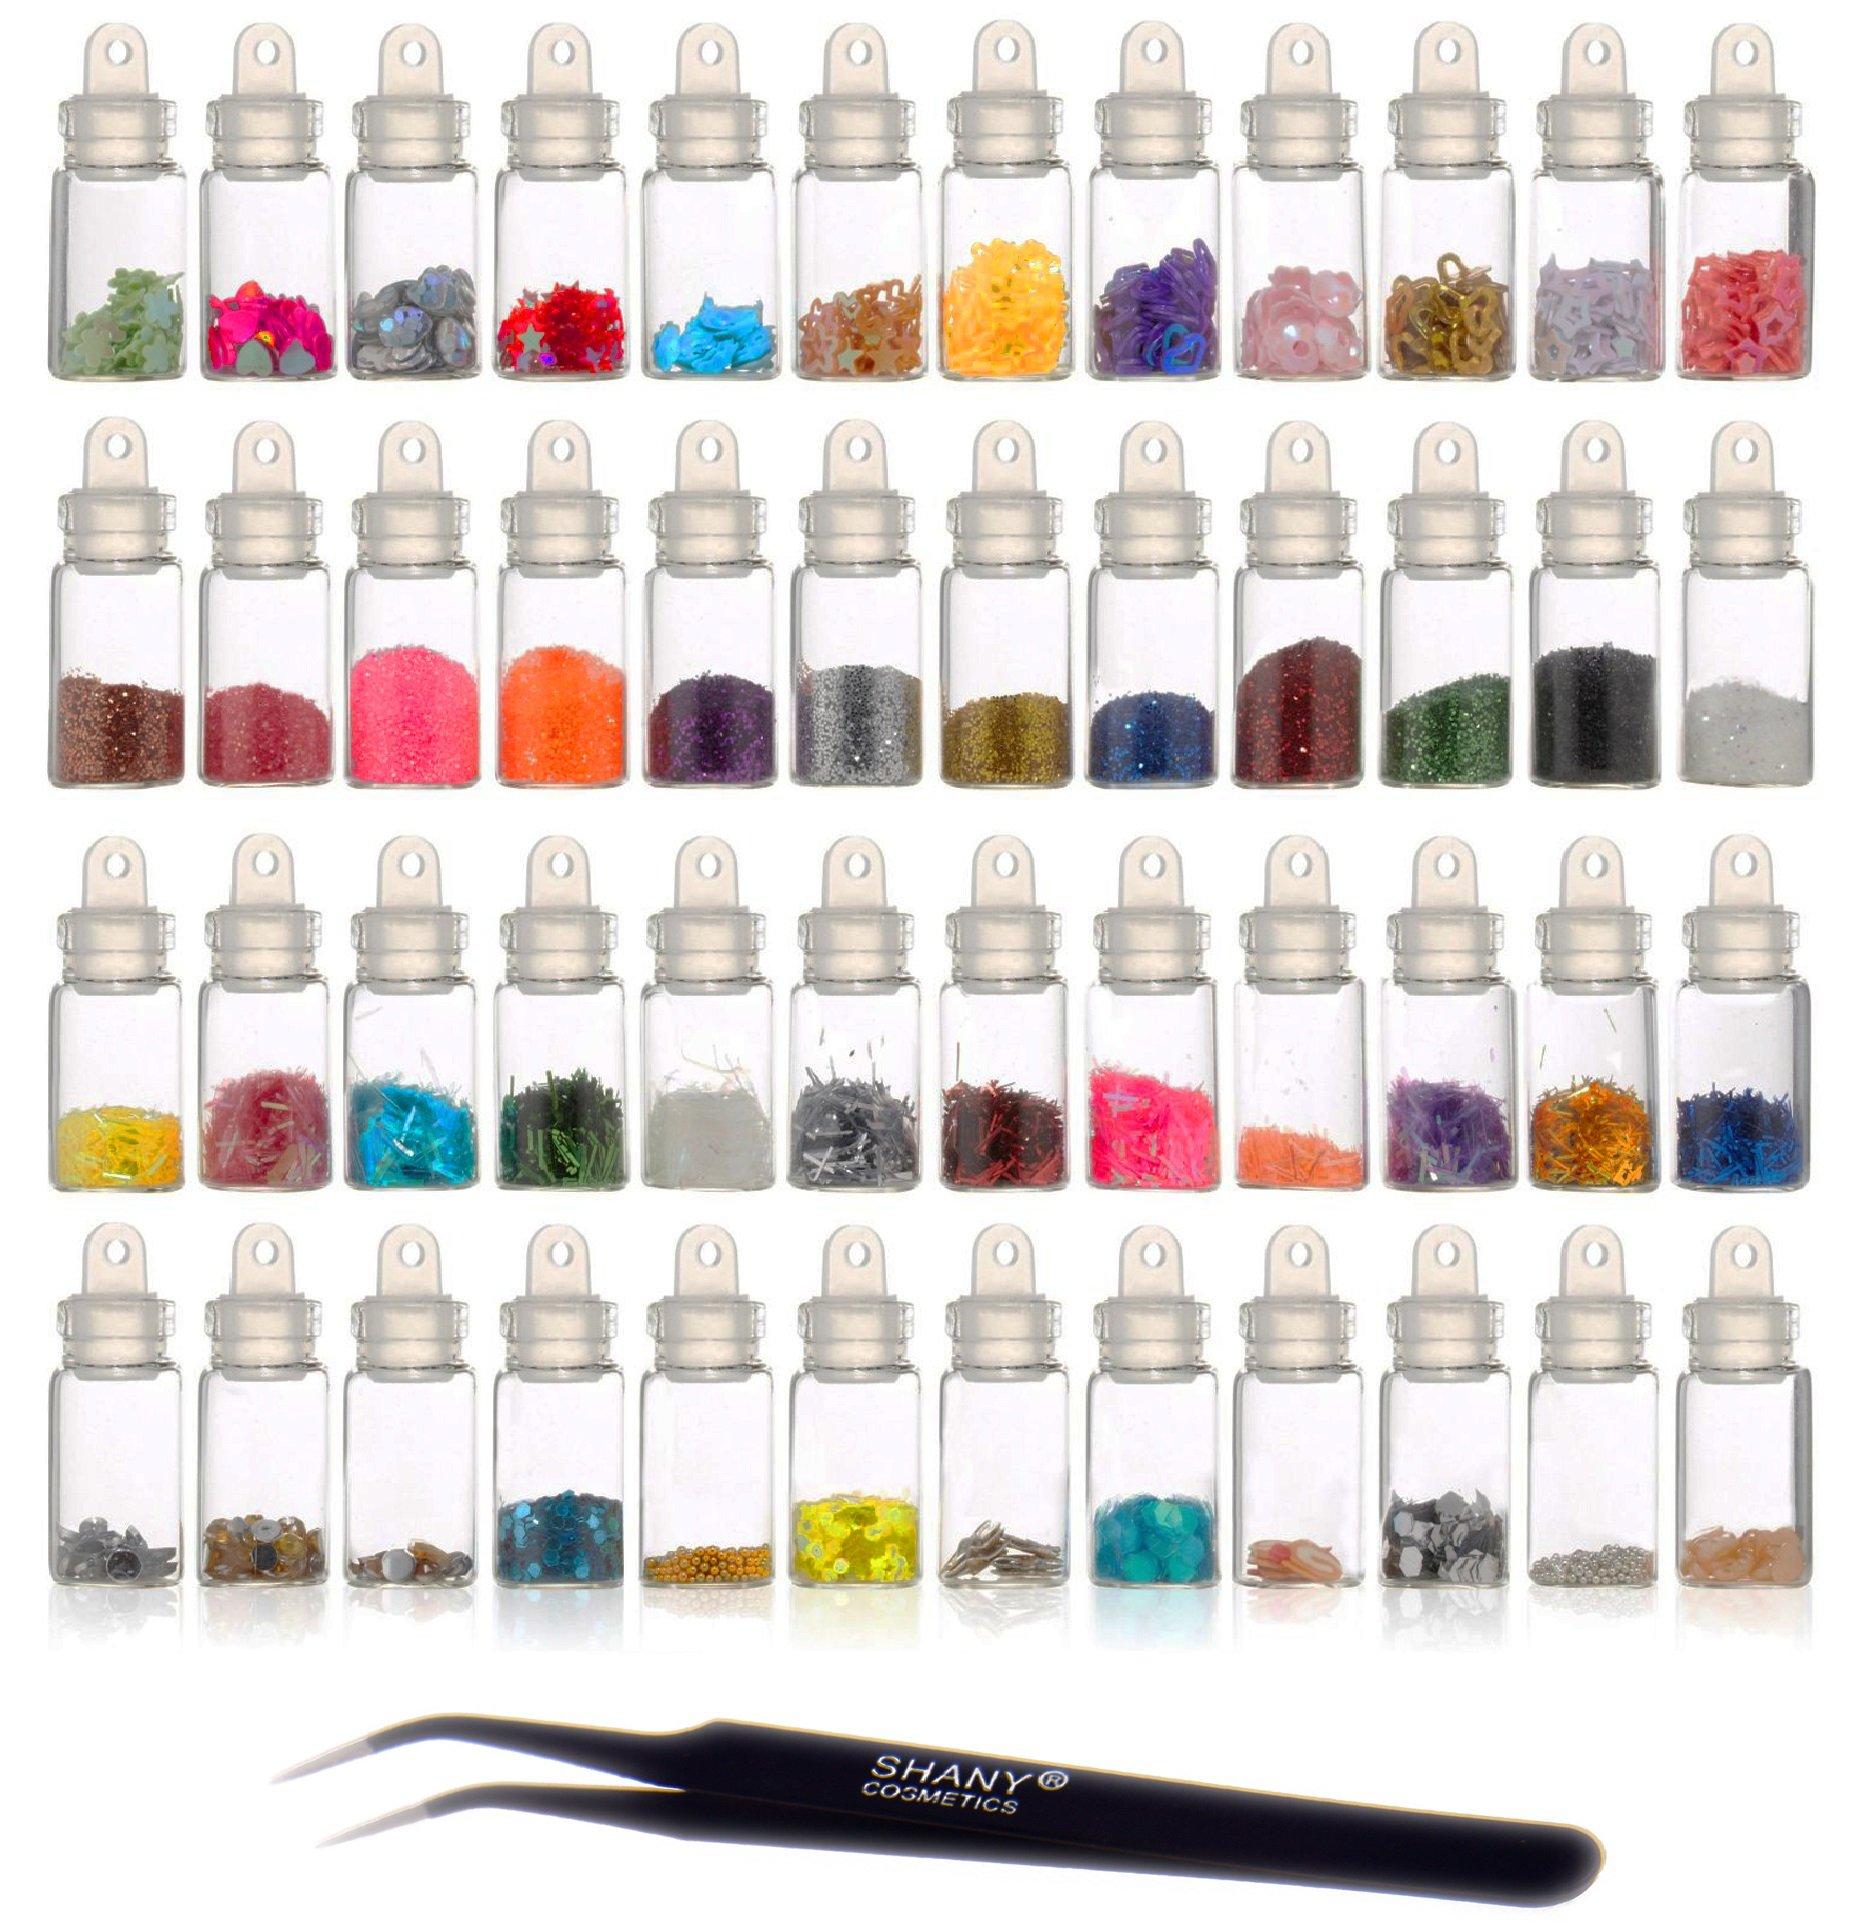 Amazon.com : SHANY Cosmetics 3D Nail Art Decoration Mini Bottles ...